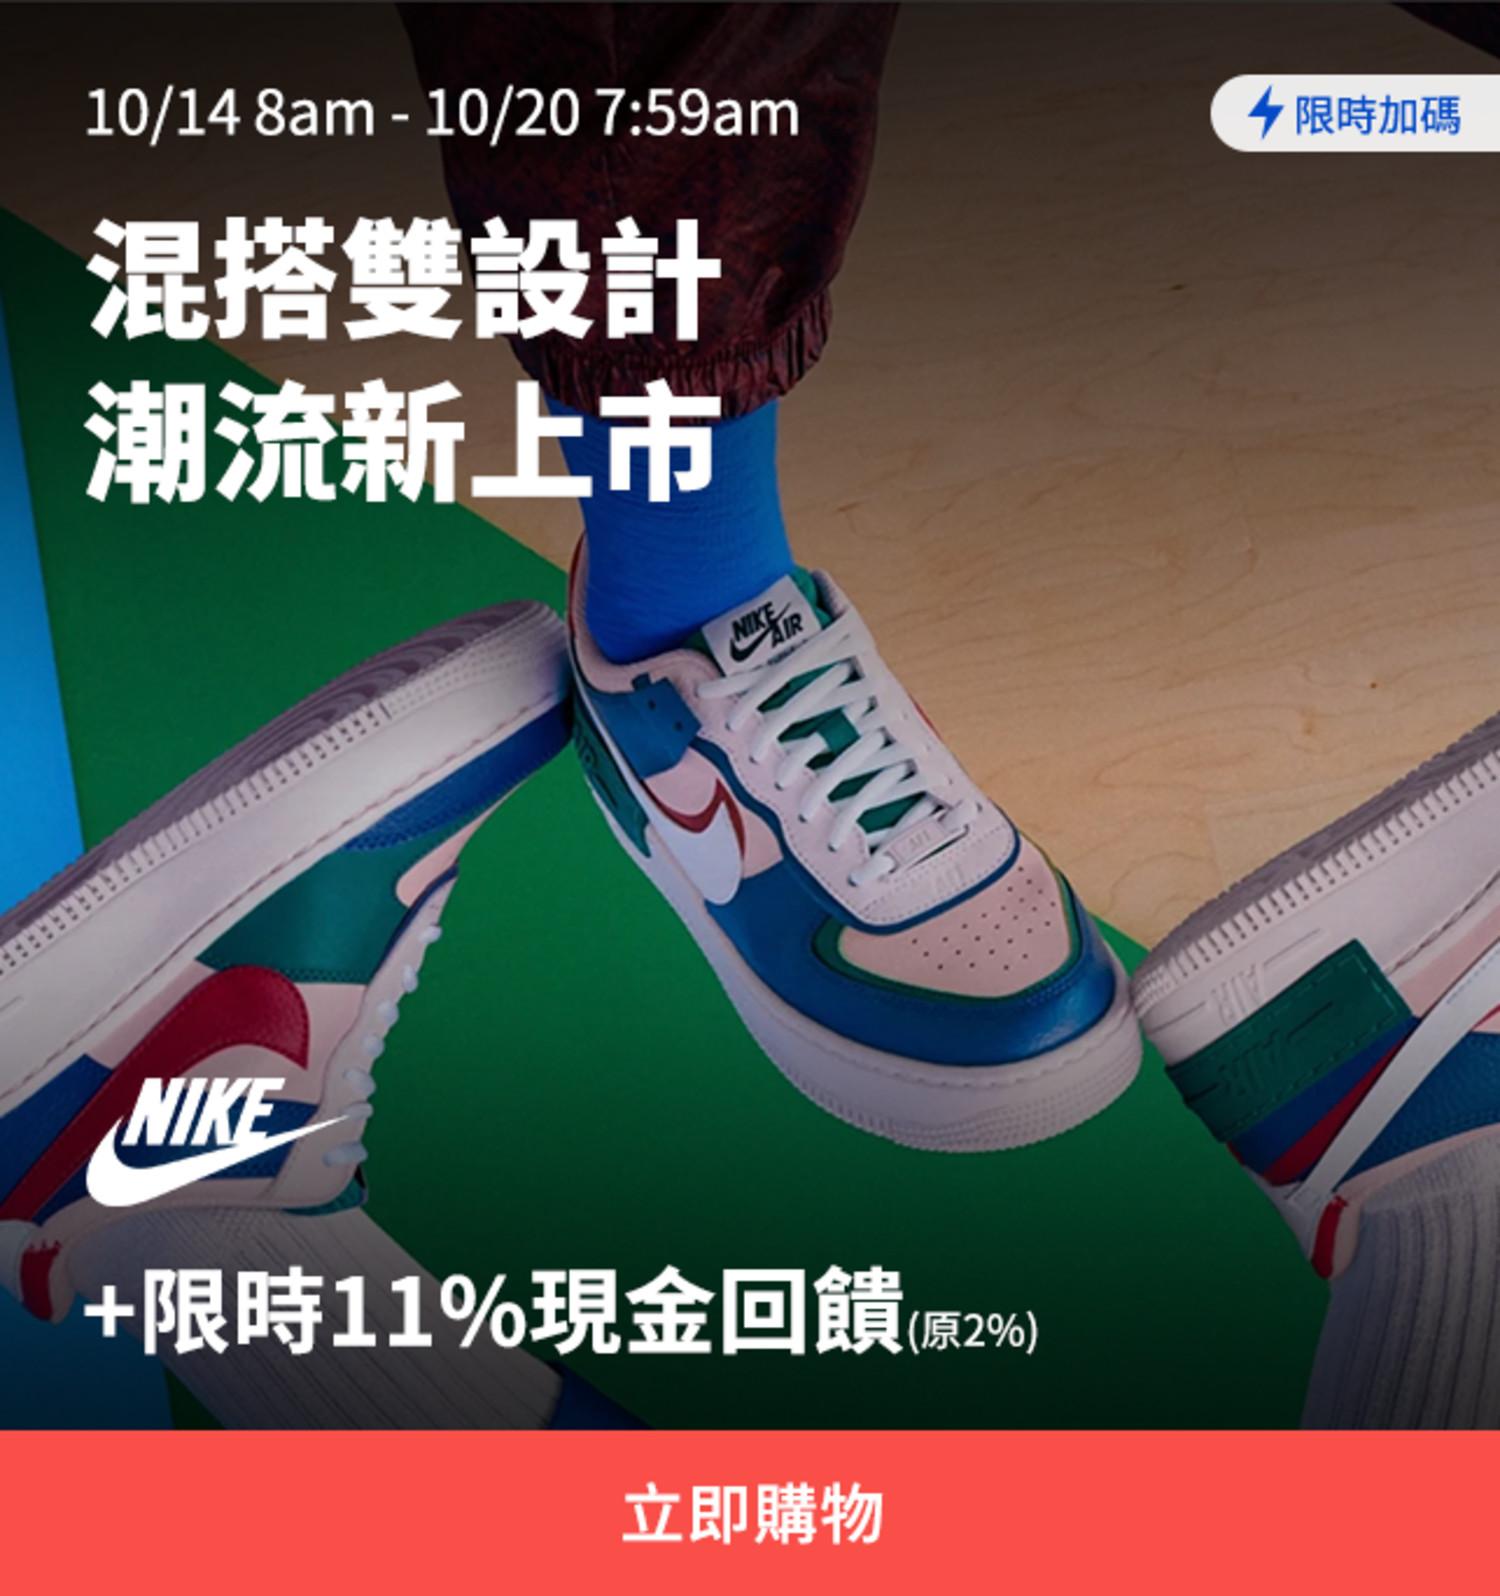 Nike 精選加碼 10/14 8am-10/20 8am